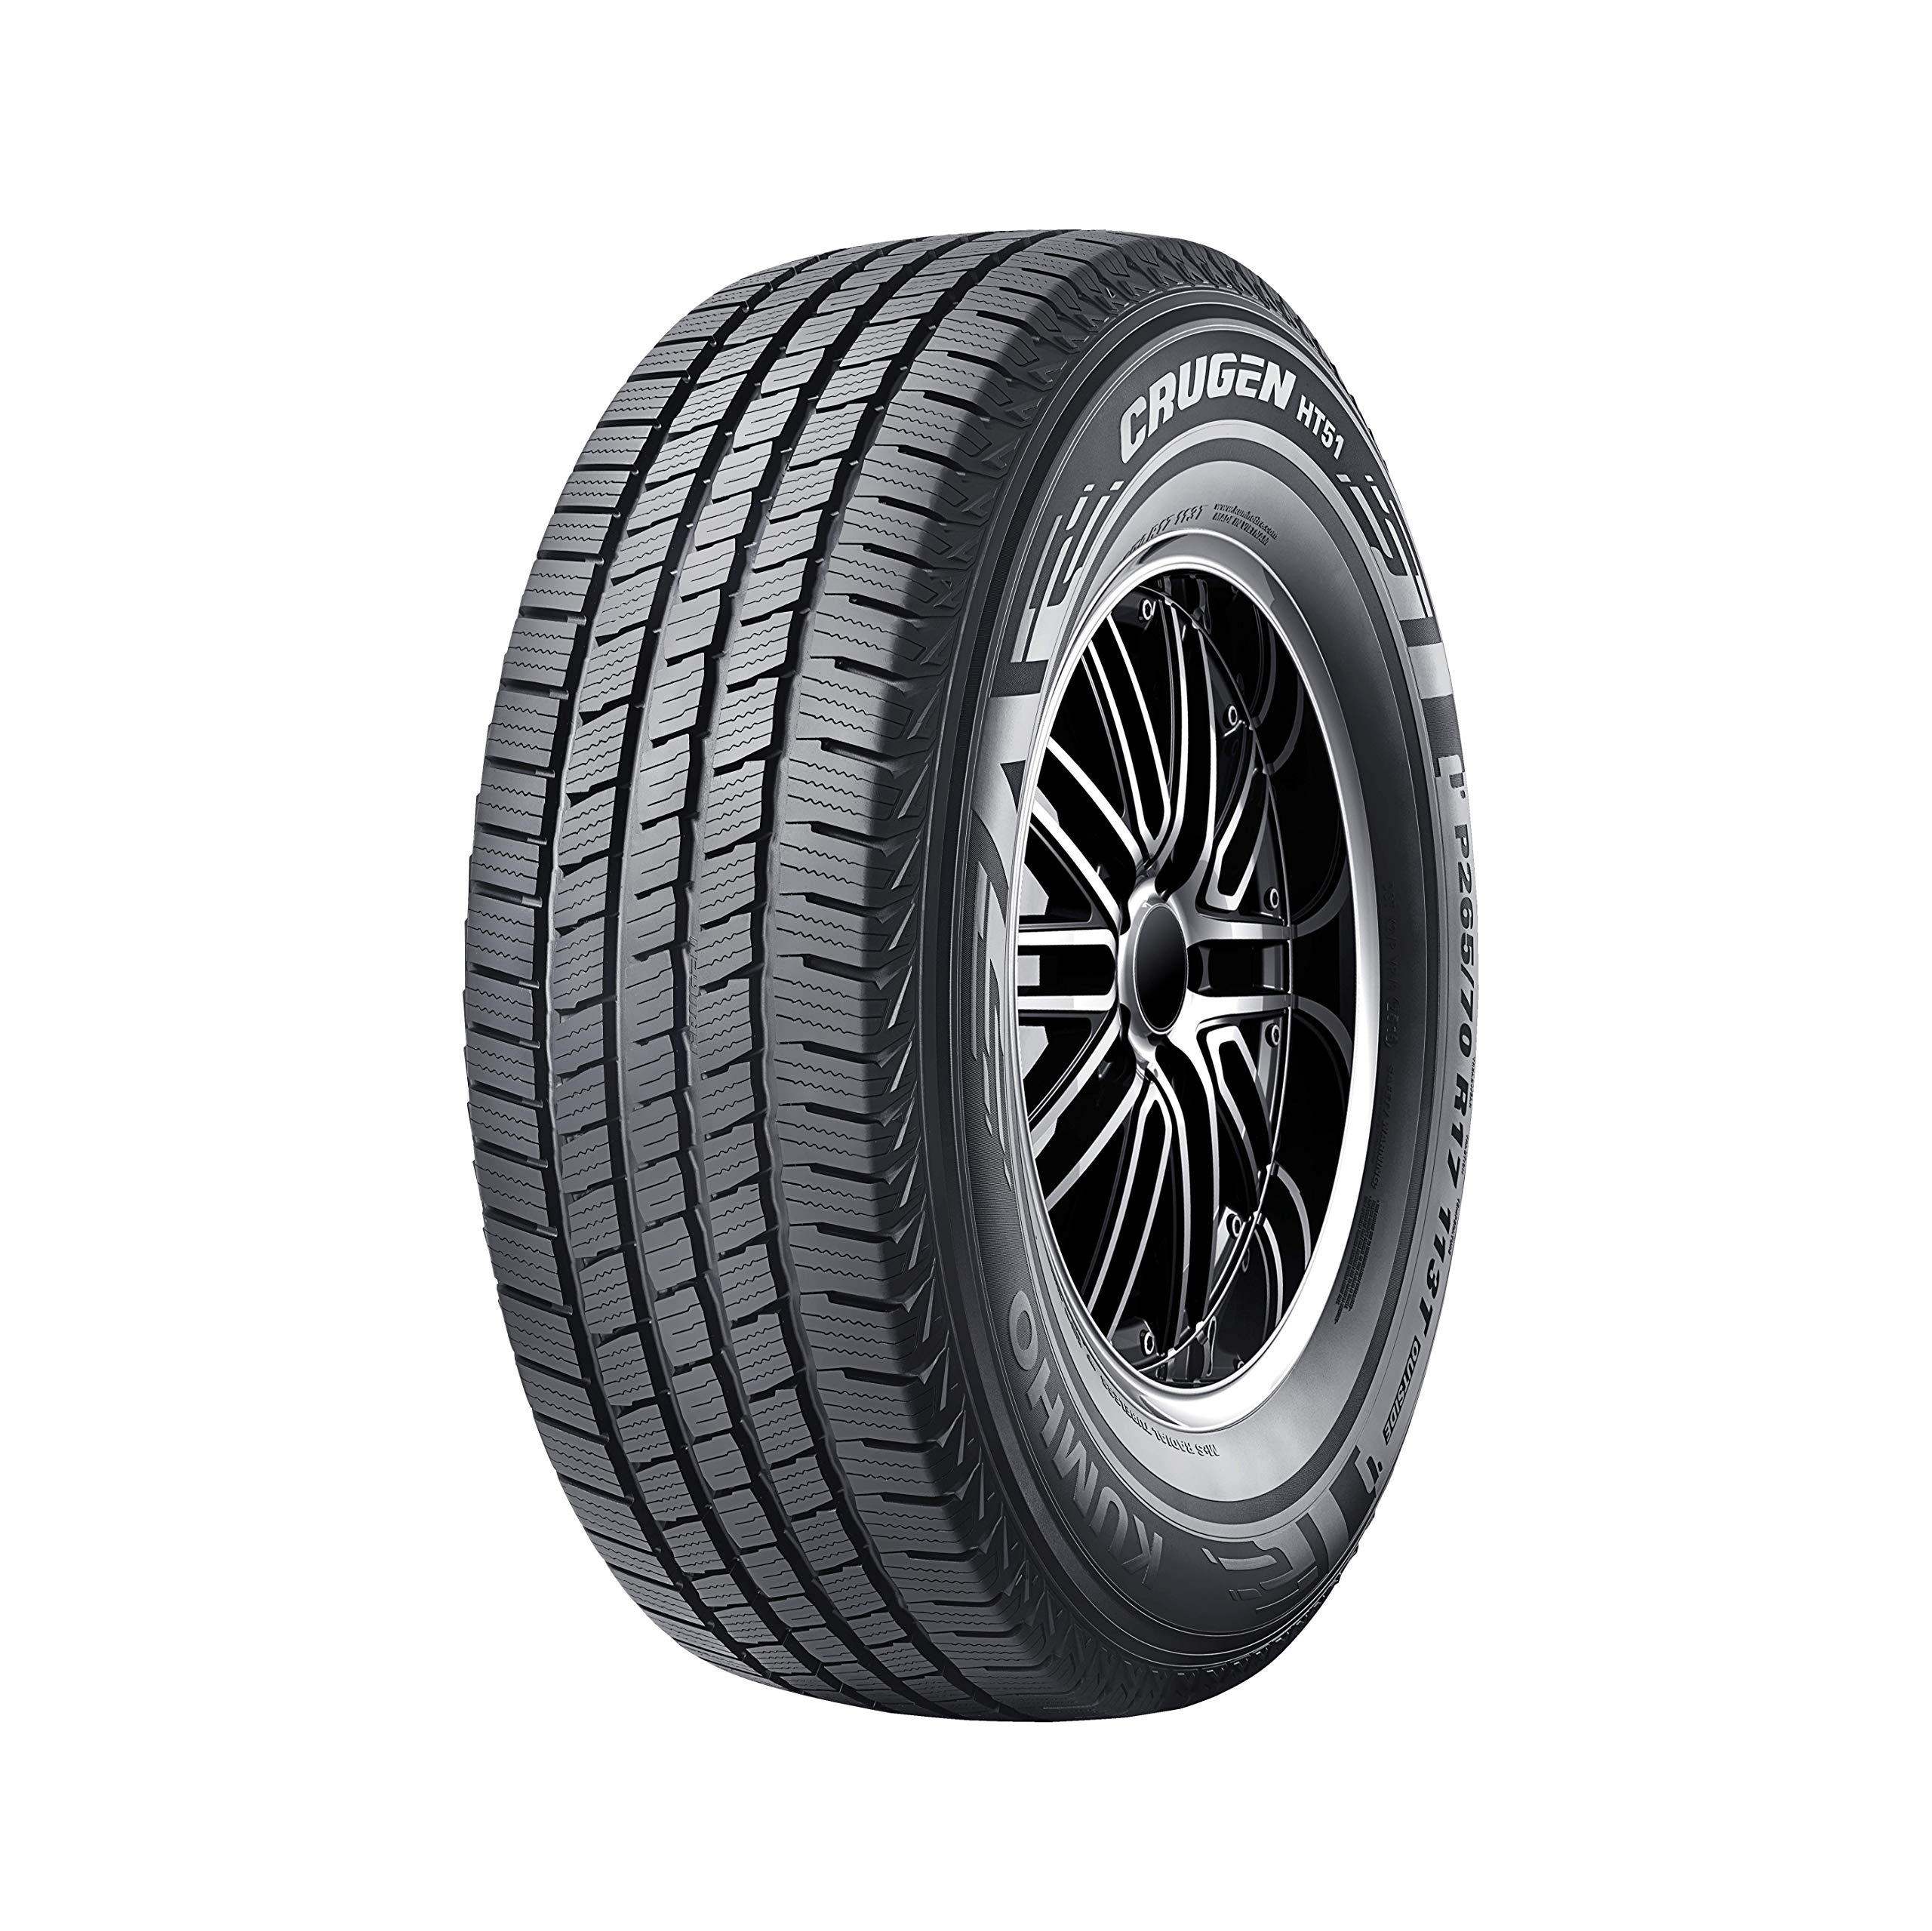 Kumho Crugen HT51 All-Season Tire - 265/50R20 111T